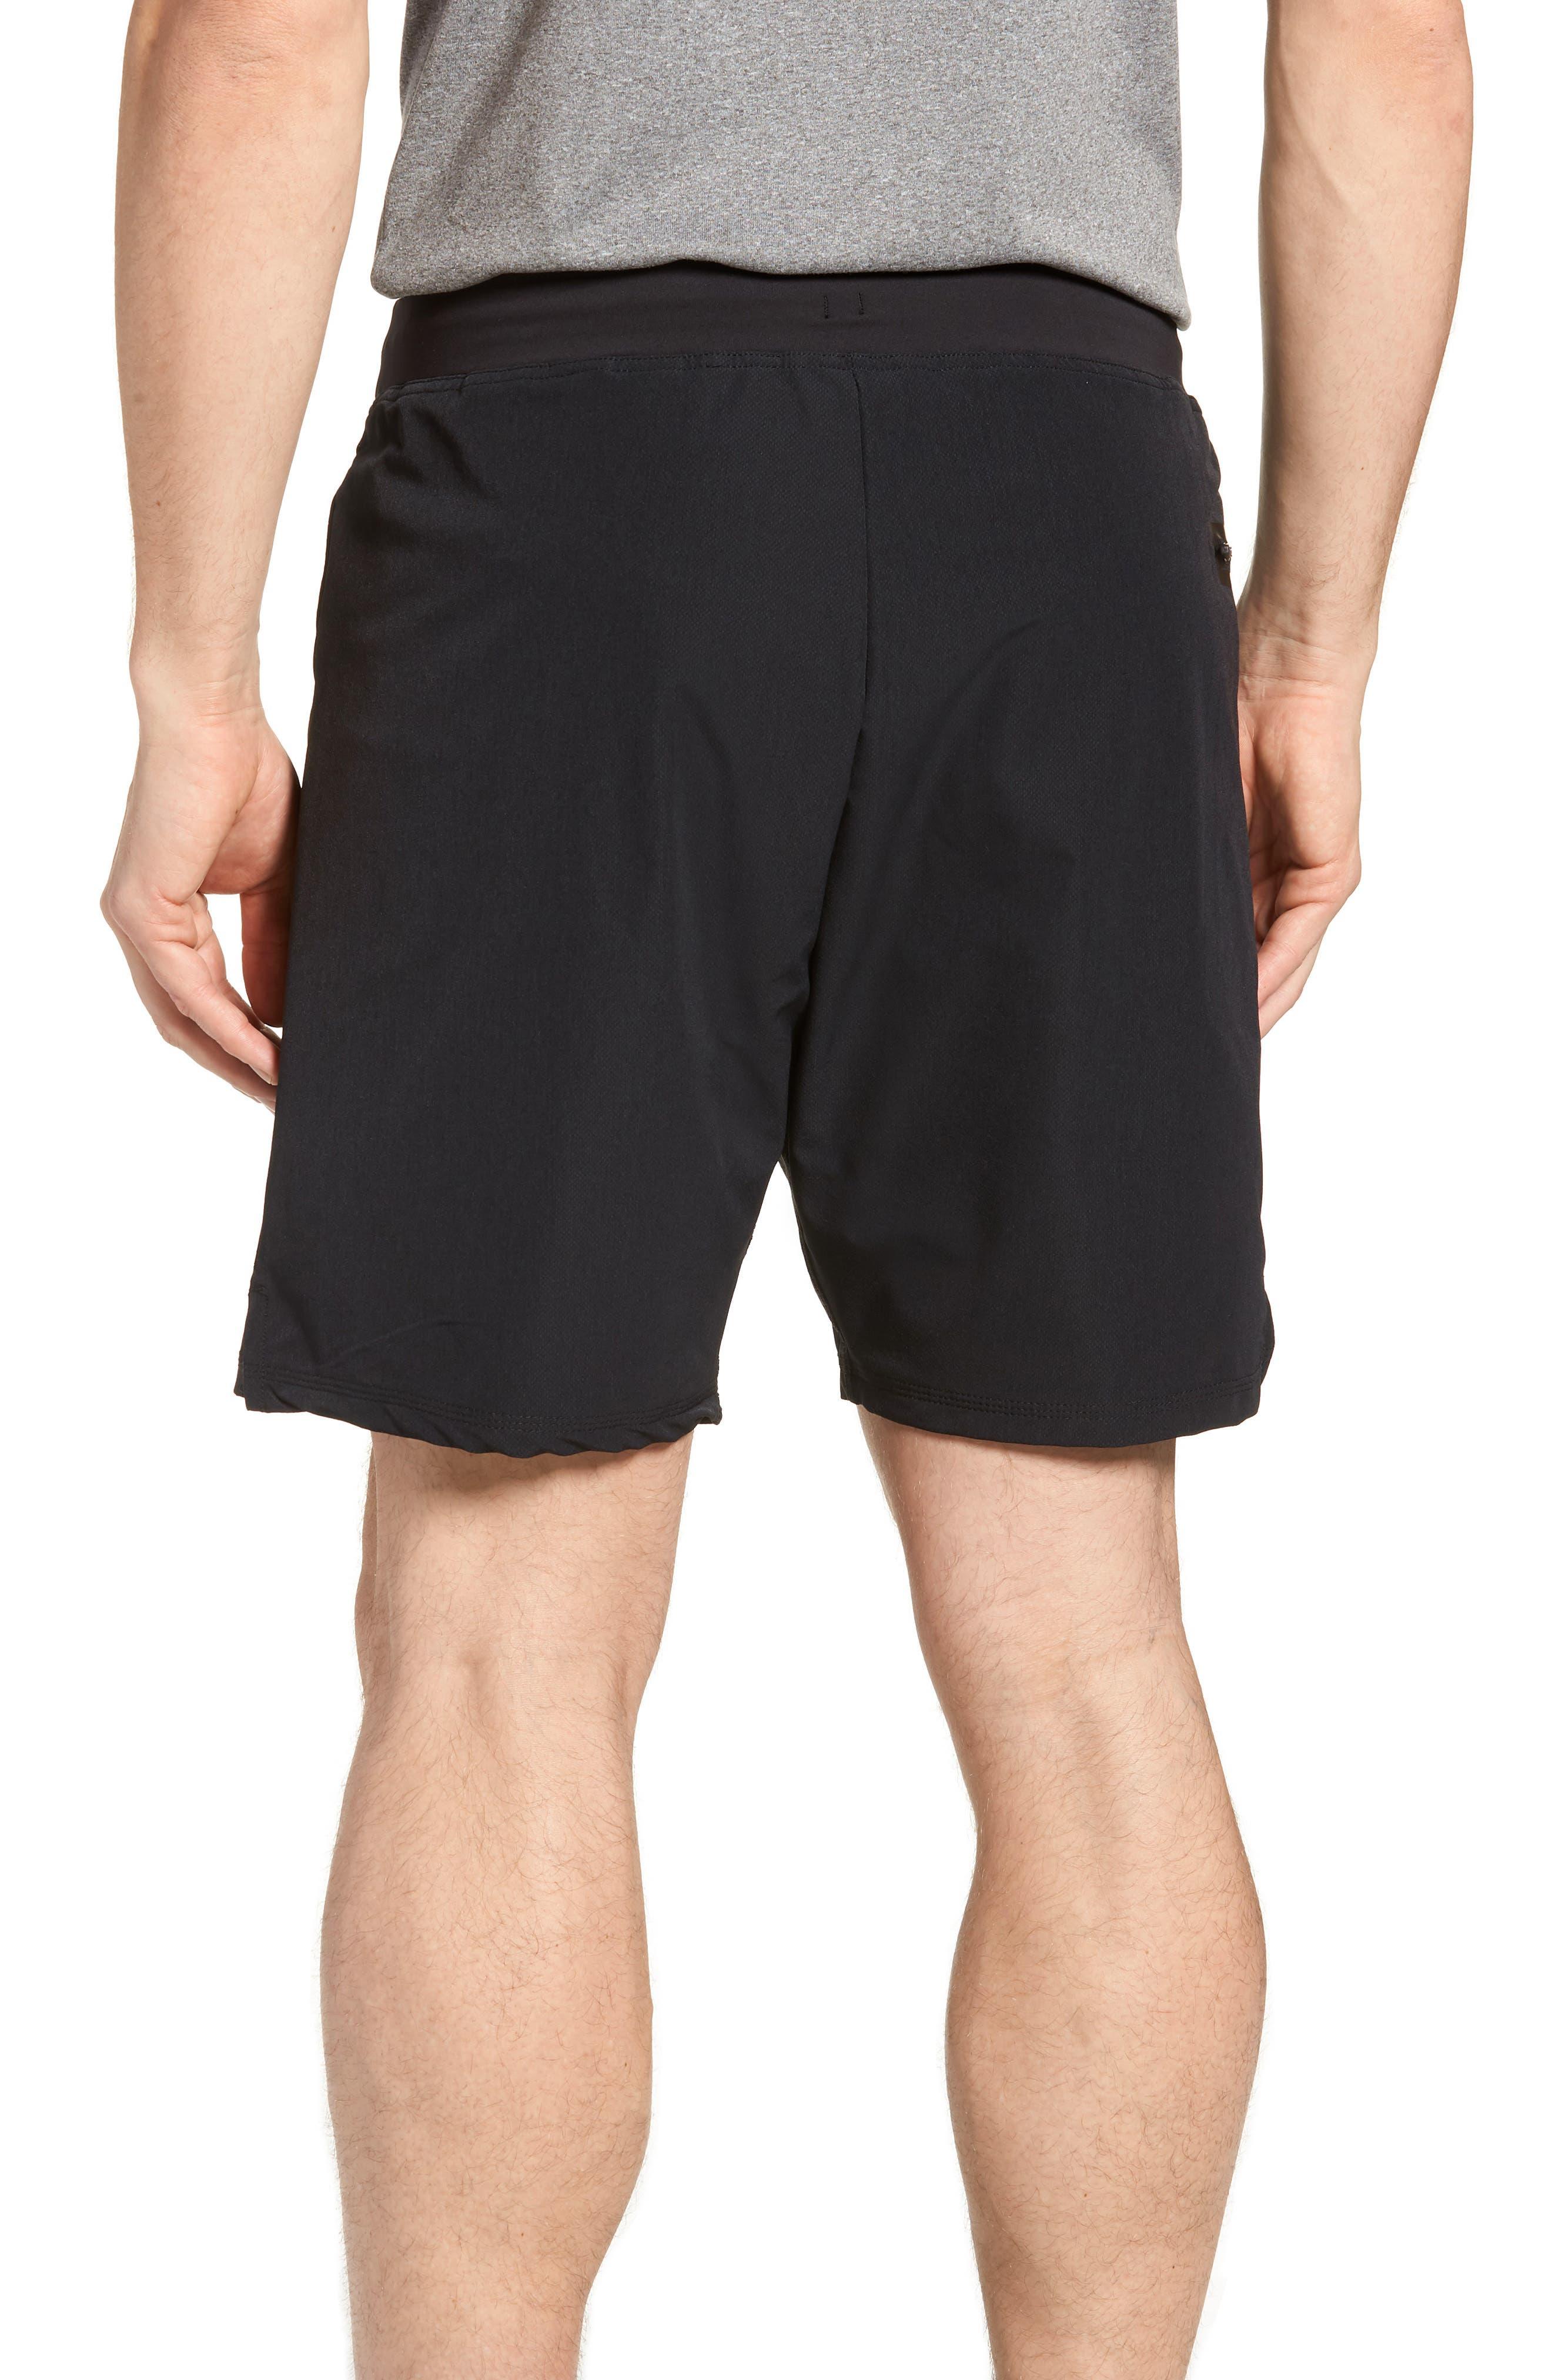 ZANEROBE Type 1 Shorts,                             Alternate thumbnail 2, color,                             001